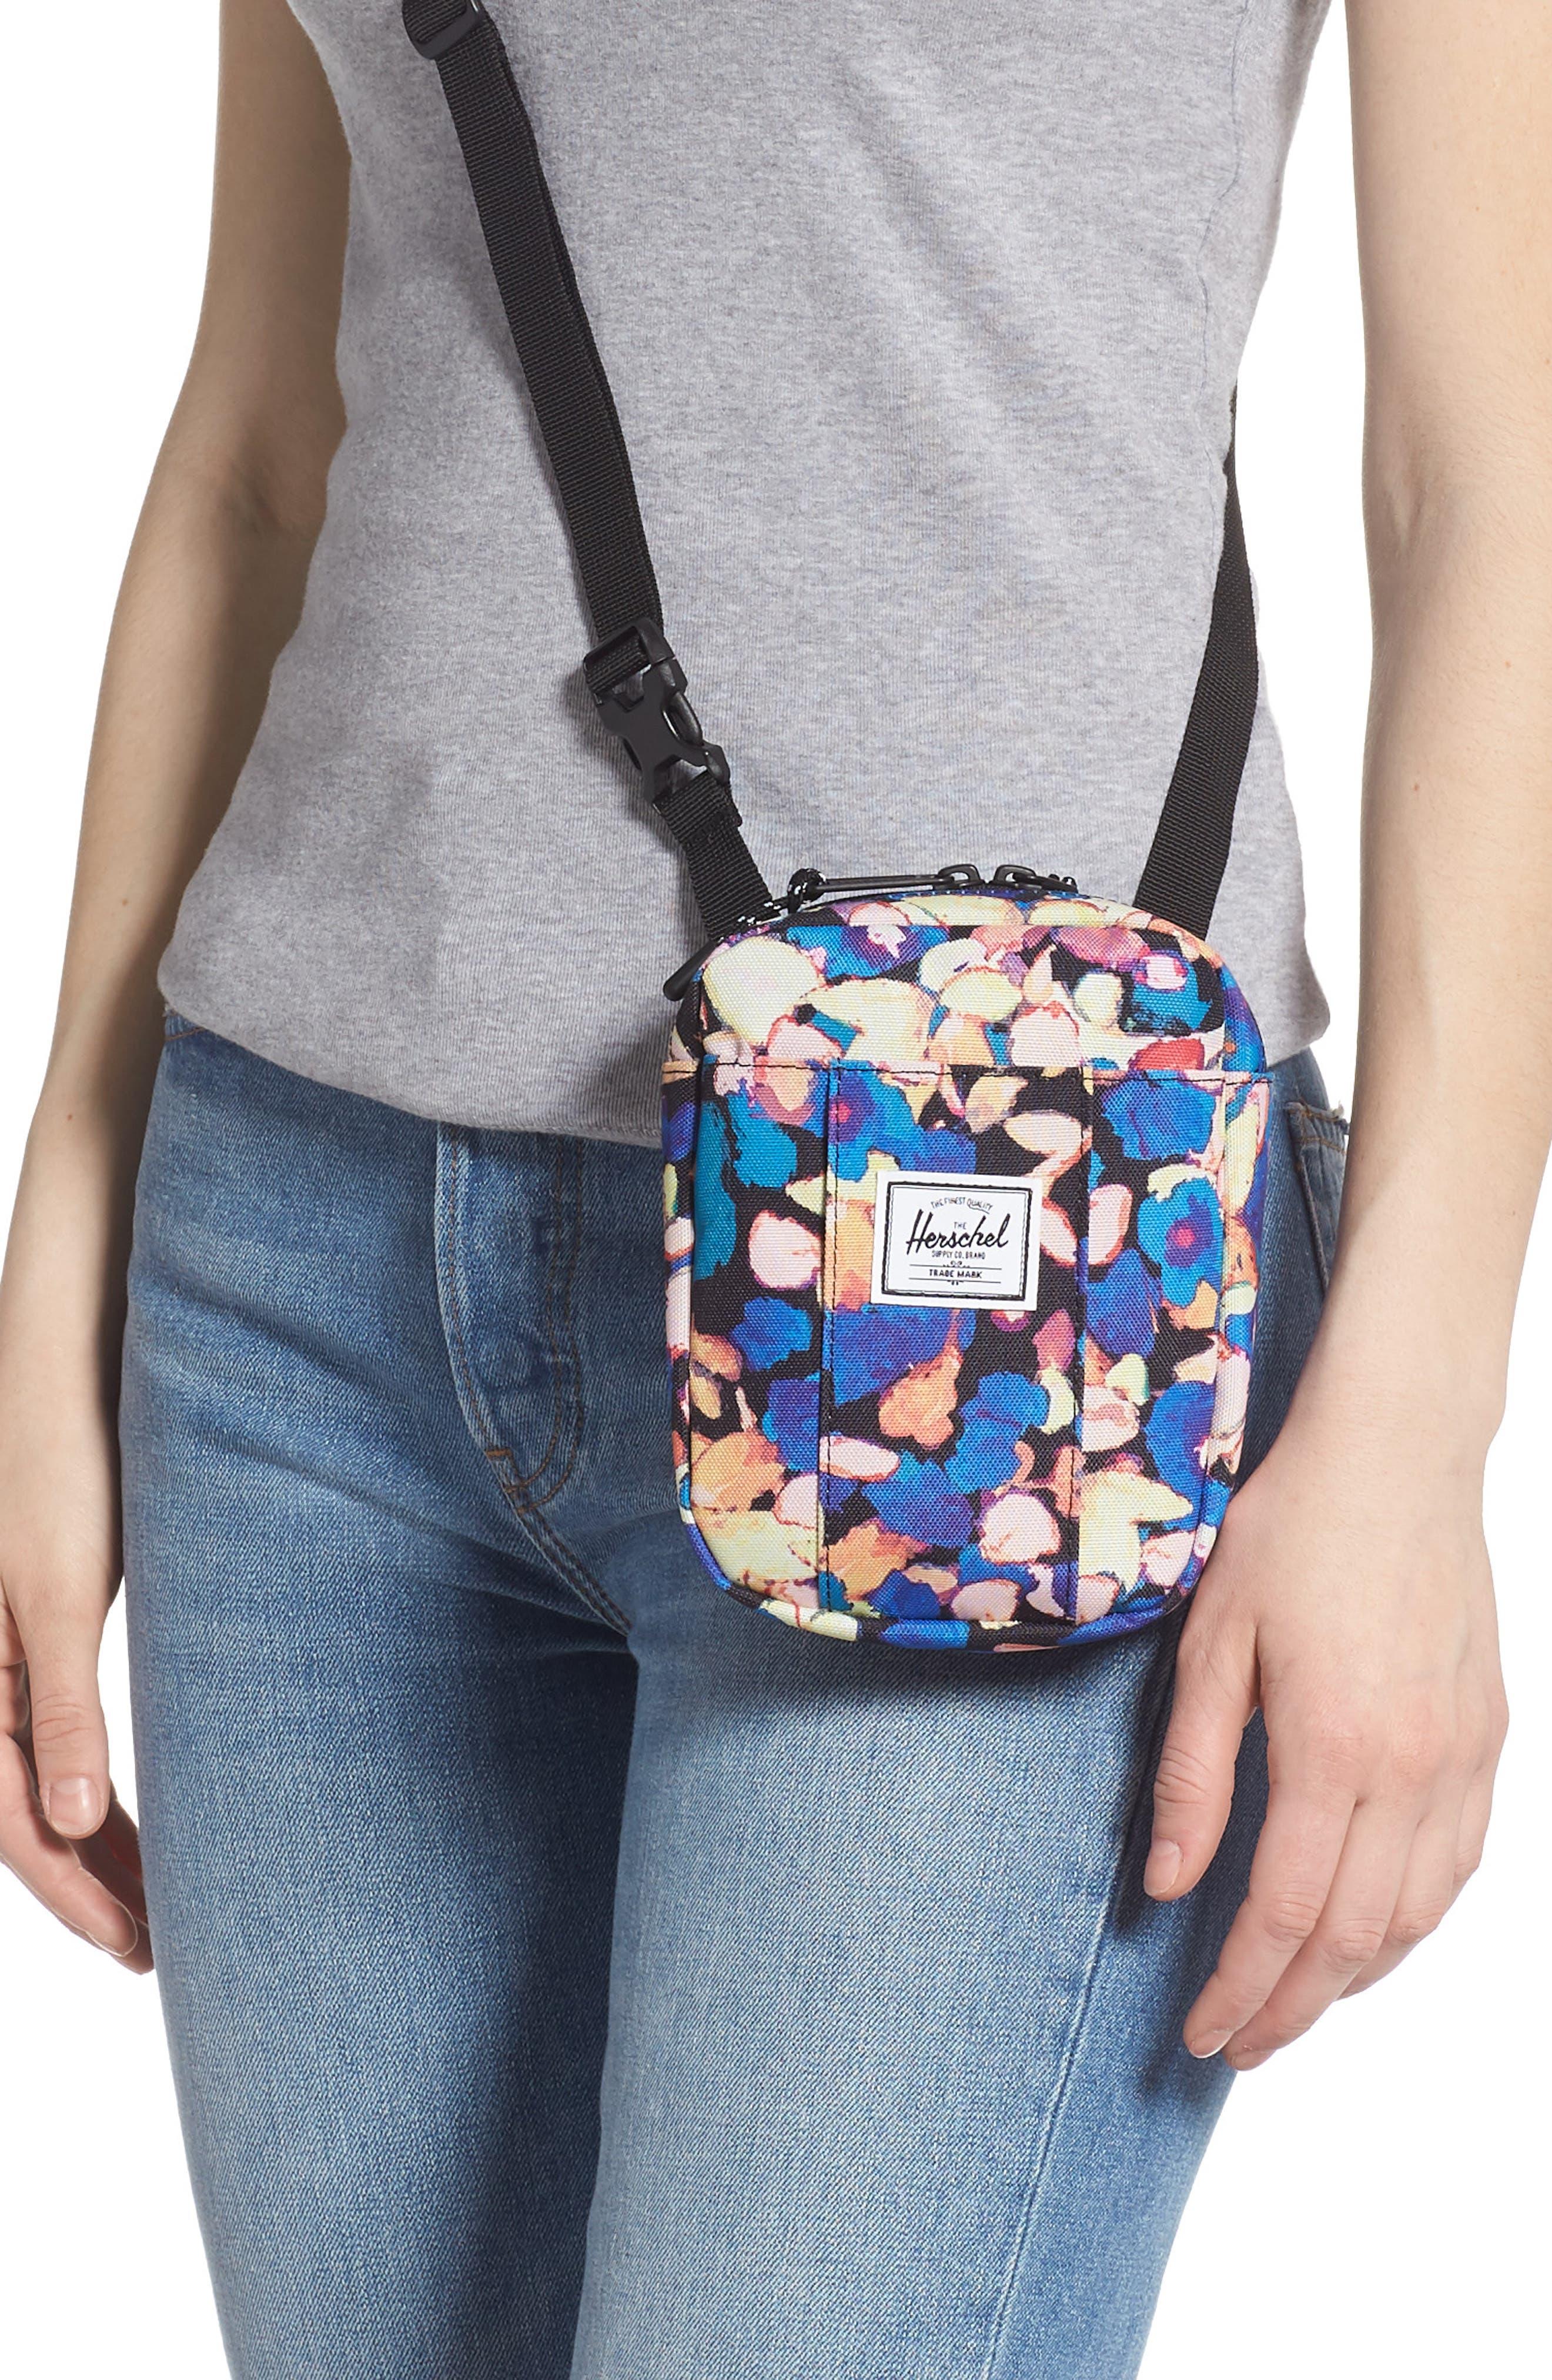 75bac255427 Herschel Supply Co. Cruz Crossbody Bag - Pink In Painted Floral ...